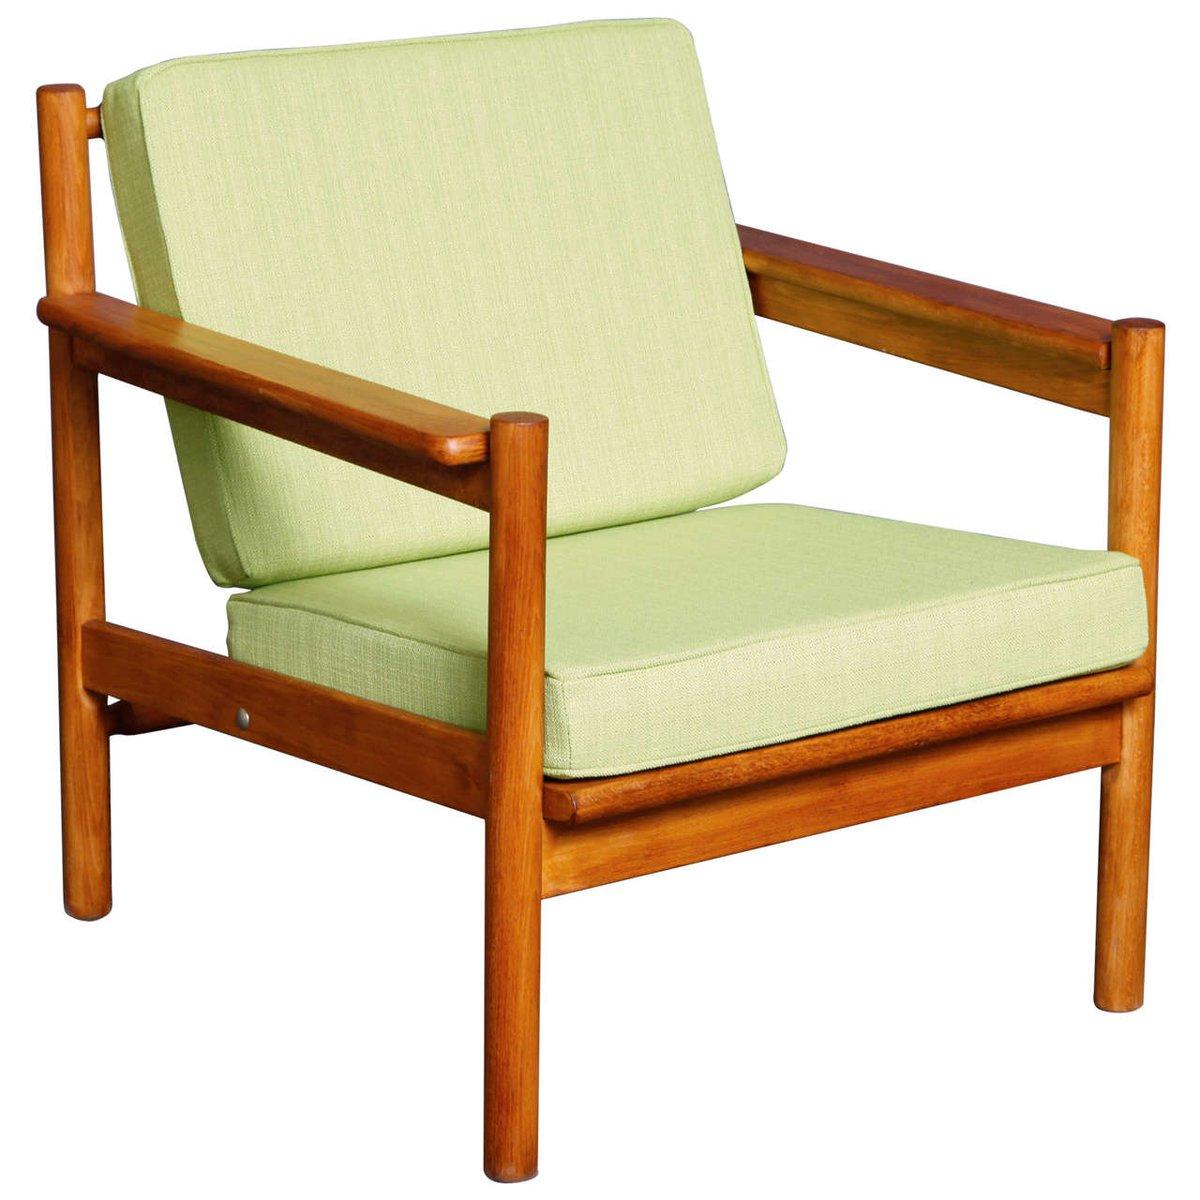 skandinavischer vintage sessel aus teak bei pamono kaufen. Black Bedroom Furniture Sets. Home Design Ideas